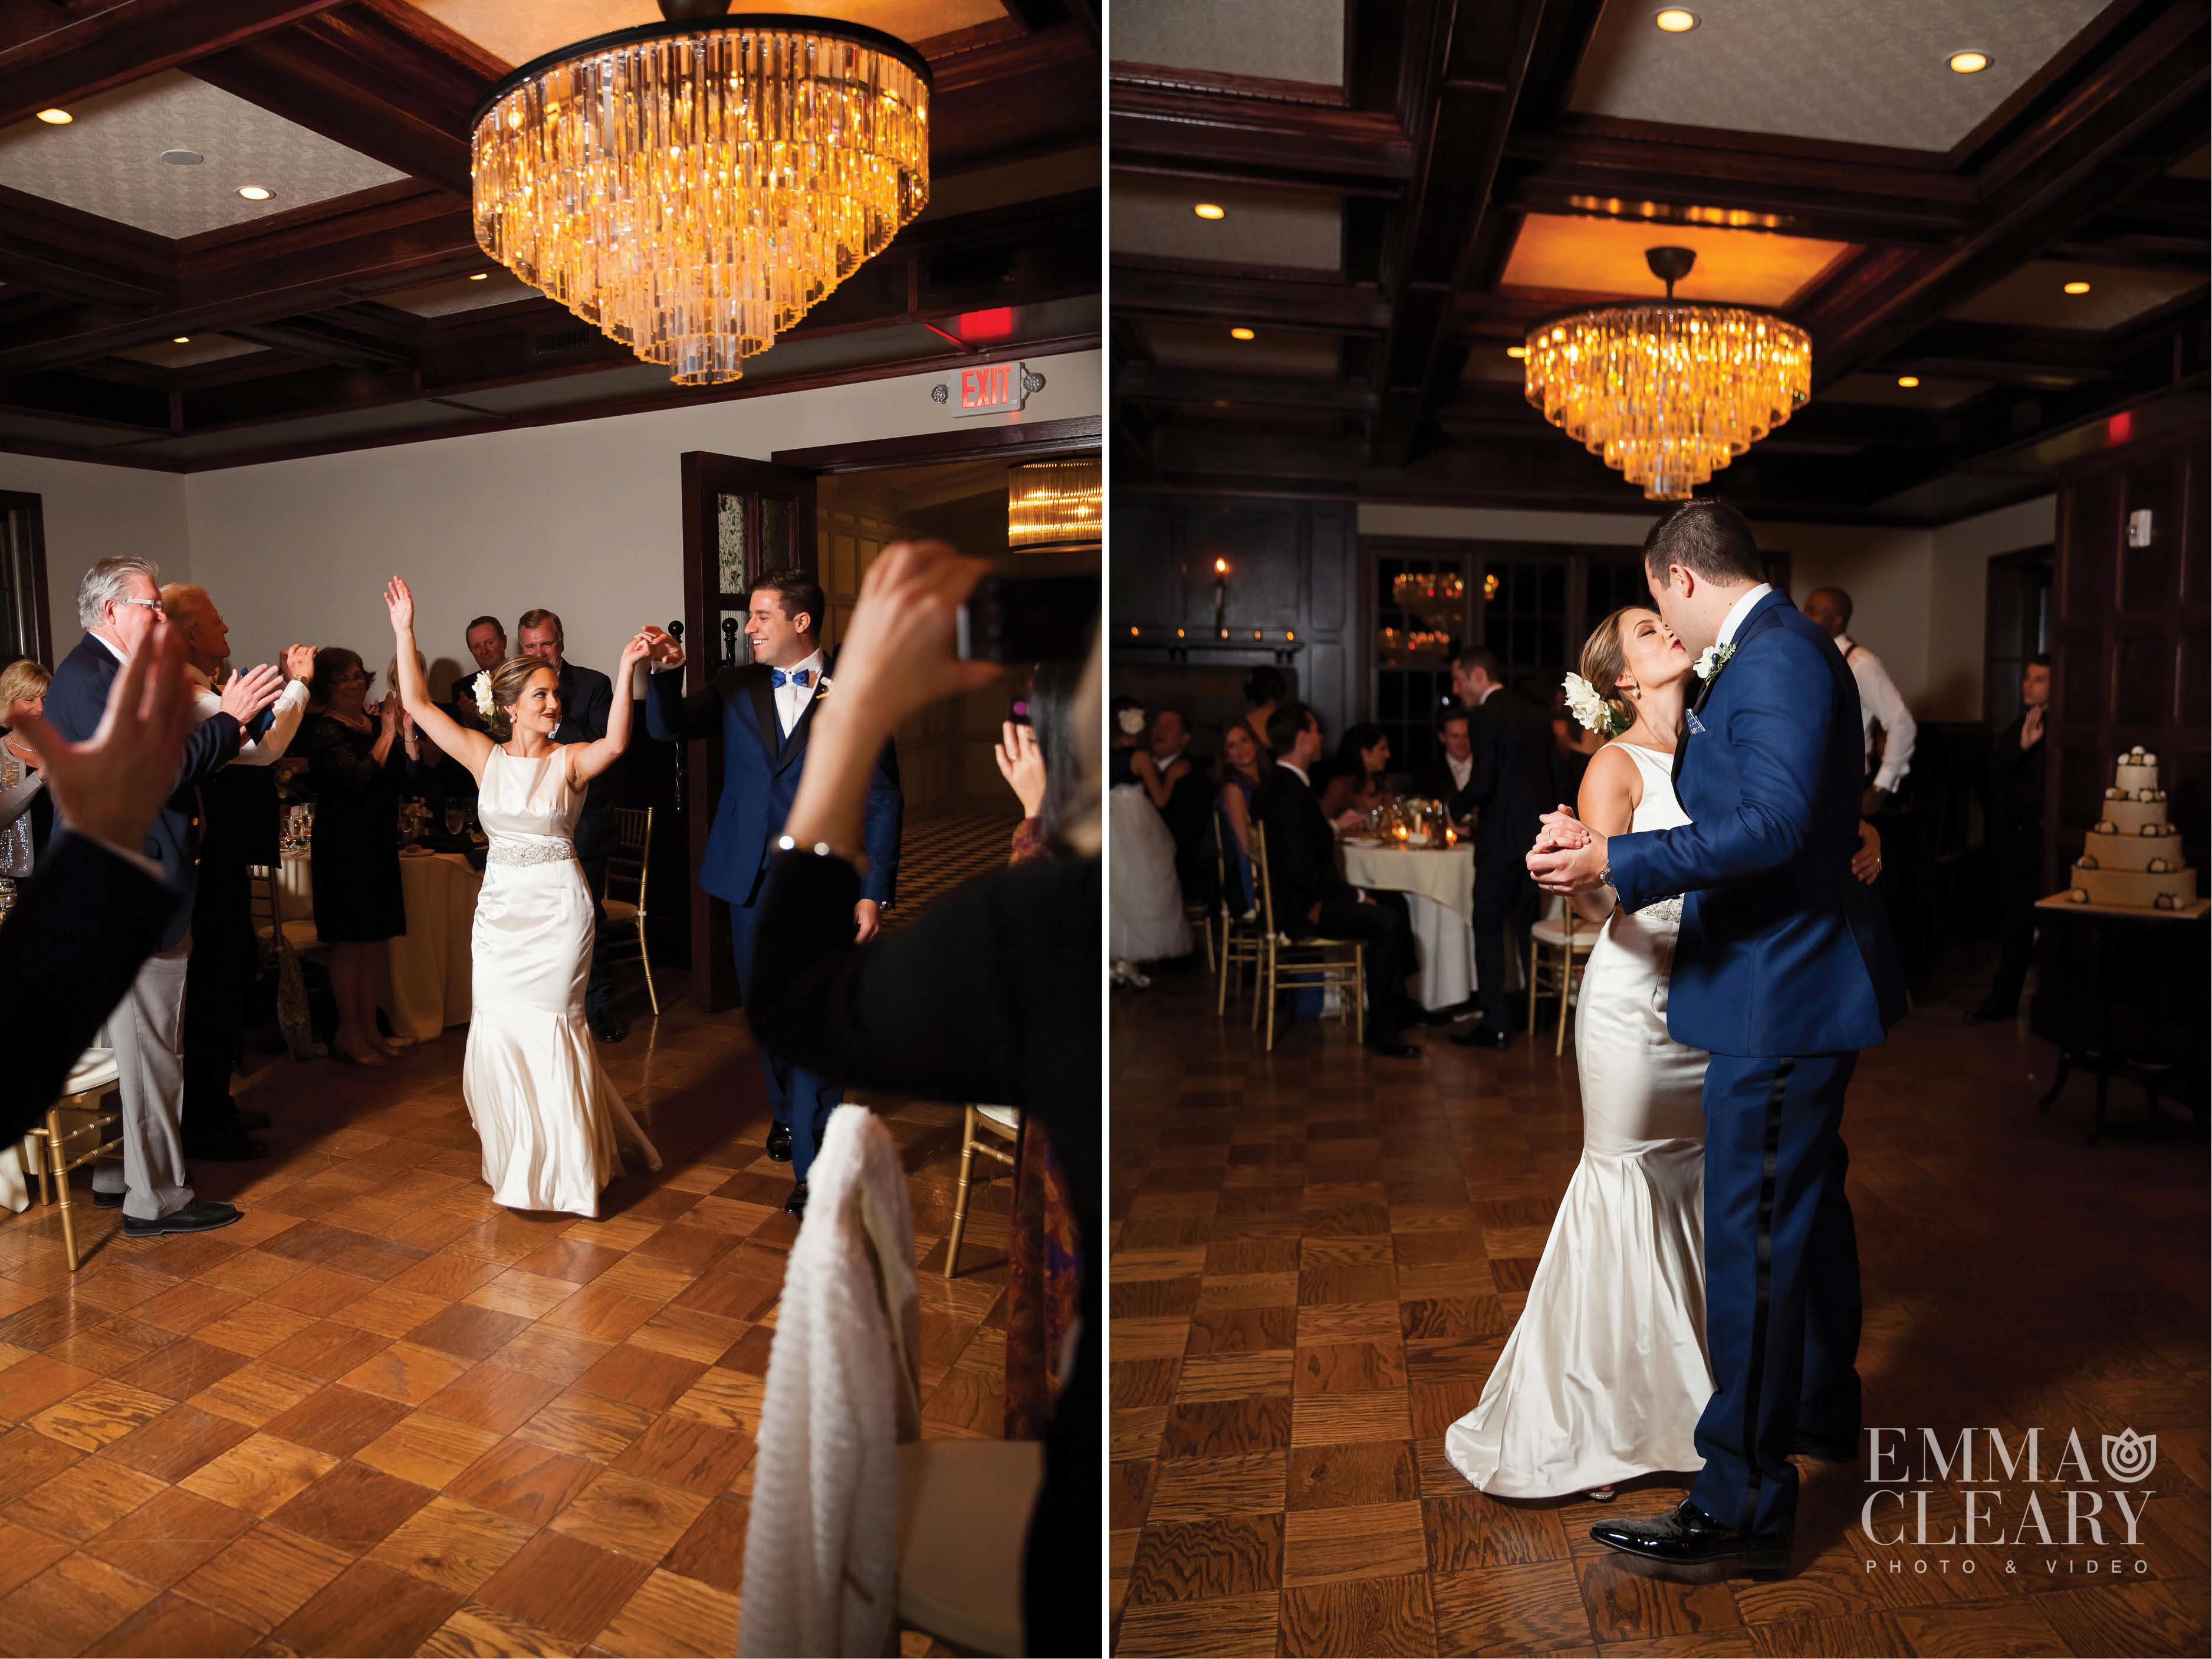 emma_cleary_photography-hotel-du-village-wedding20